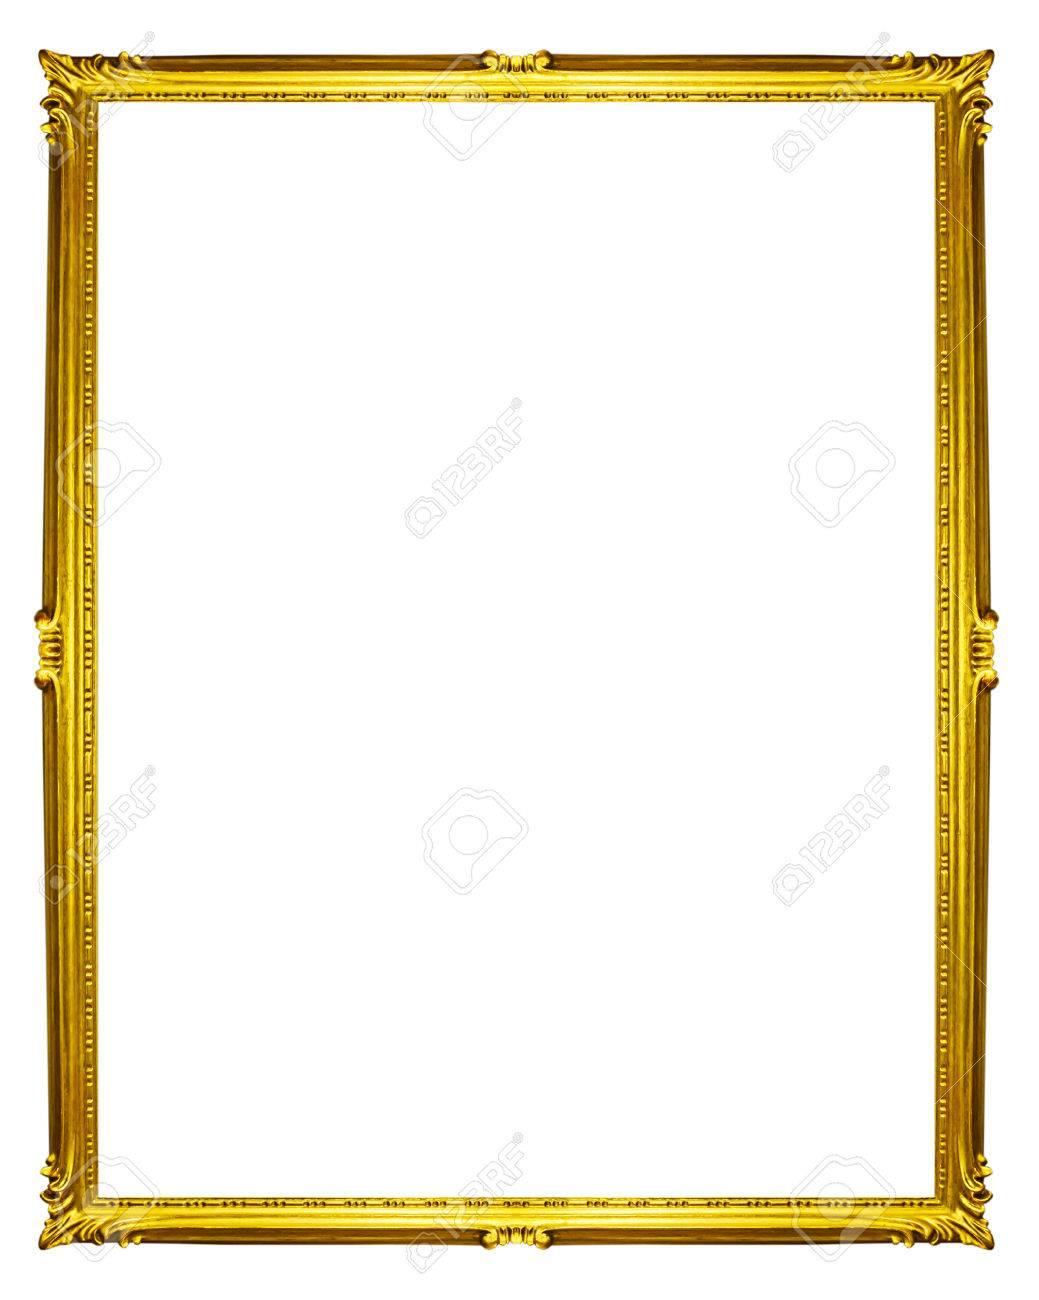 golden frame isolated on white background - 41965802